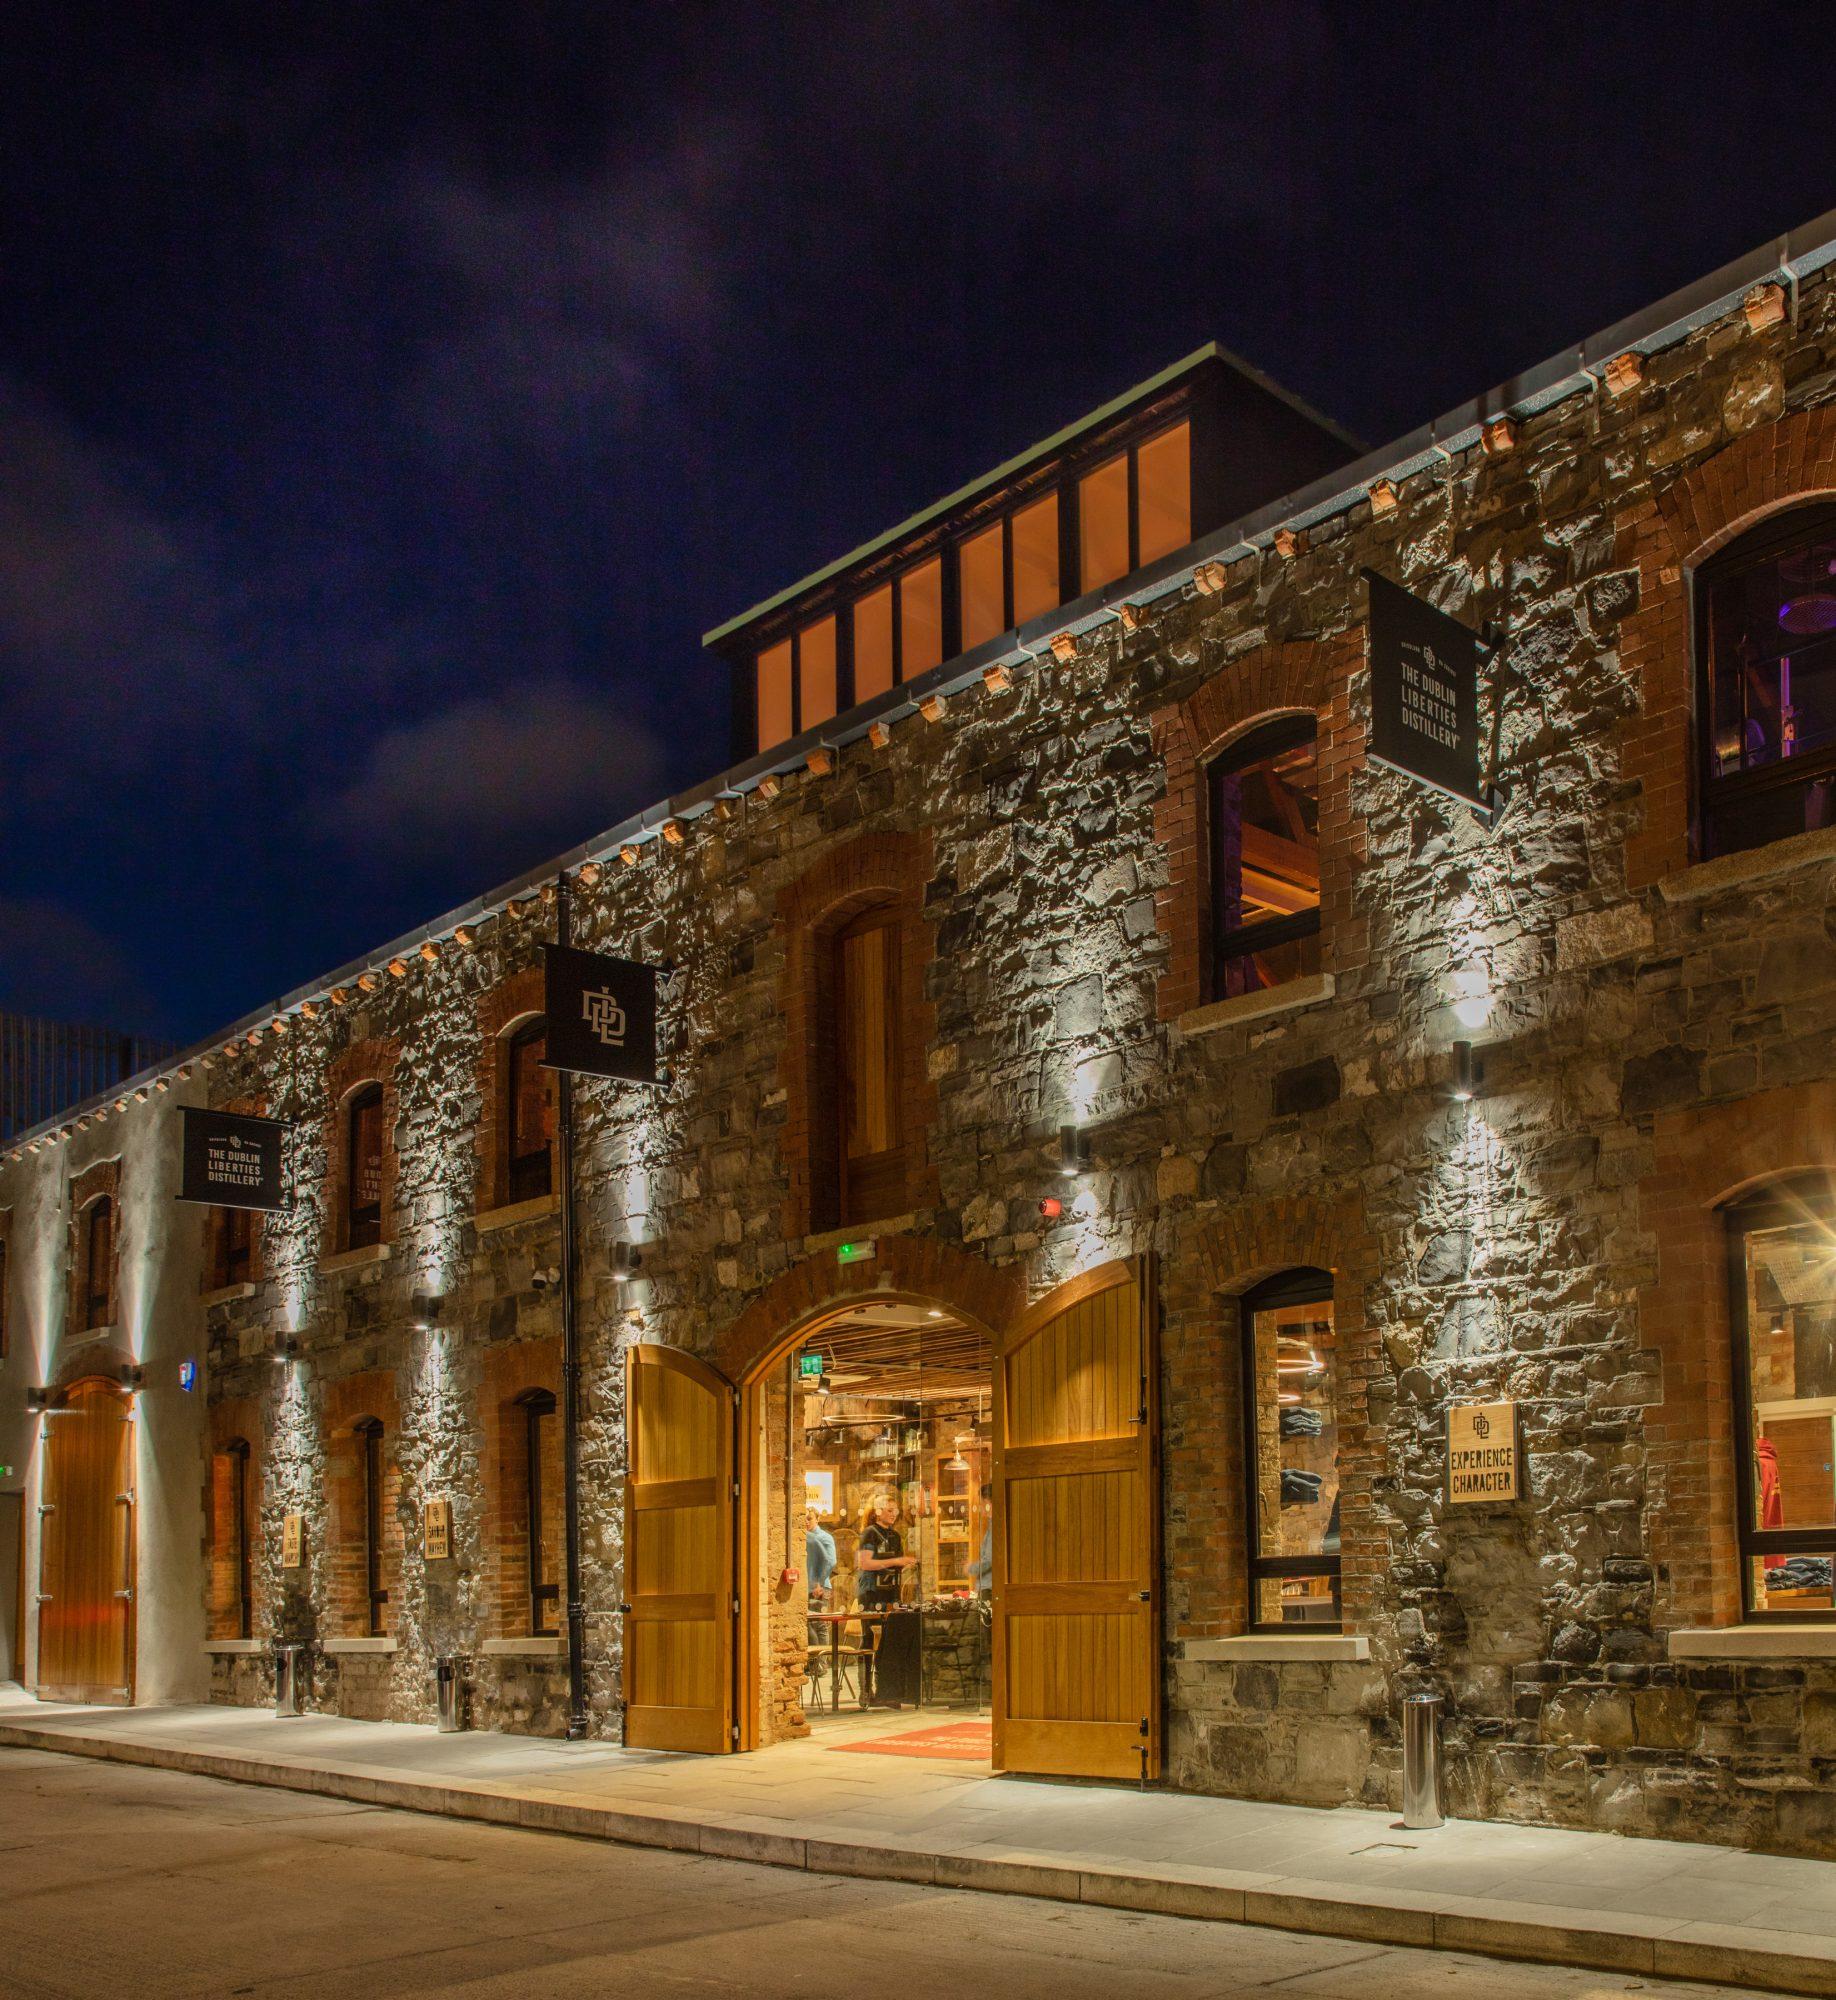 The Dublin Liberties Distillery Building exterior